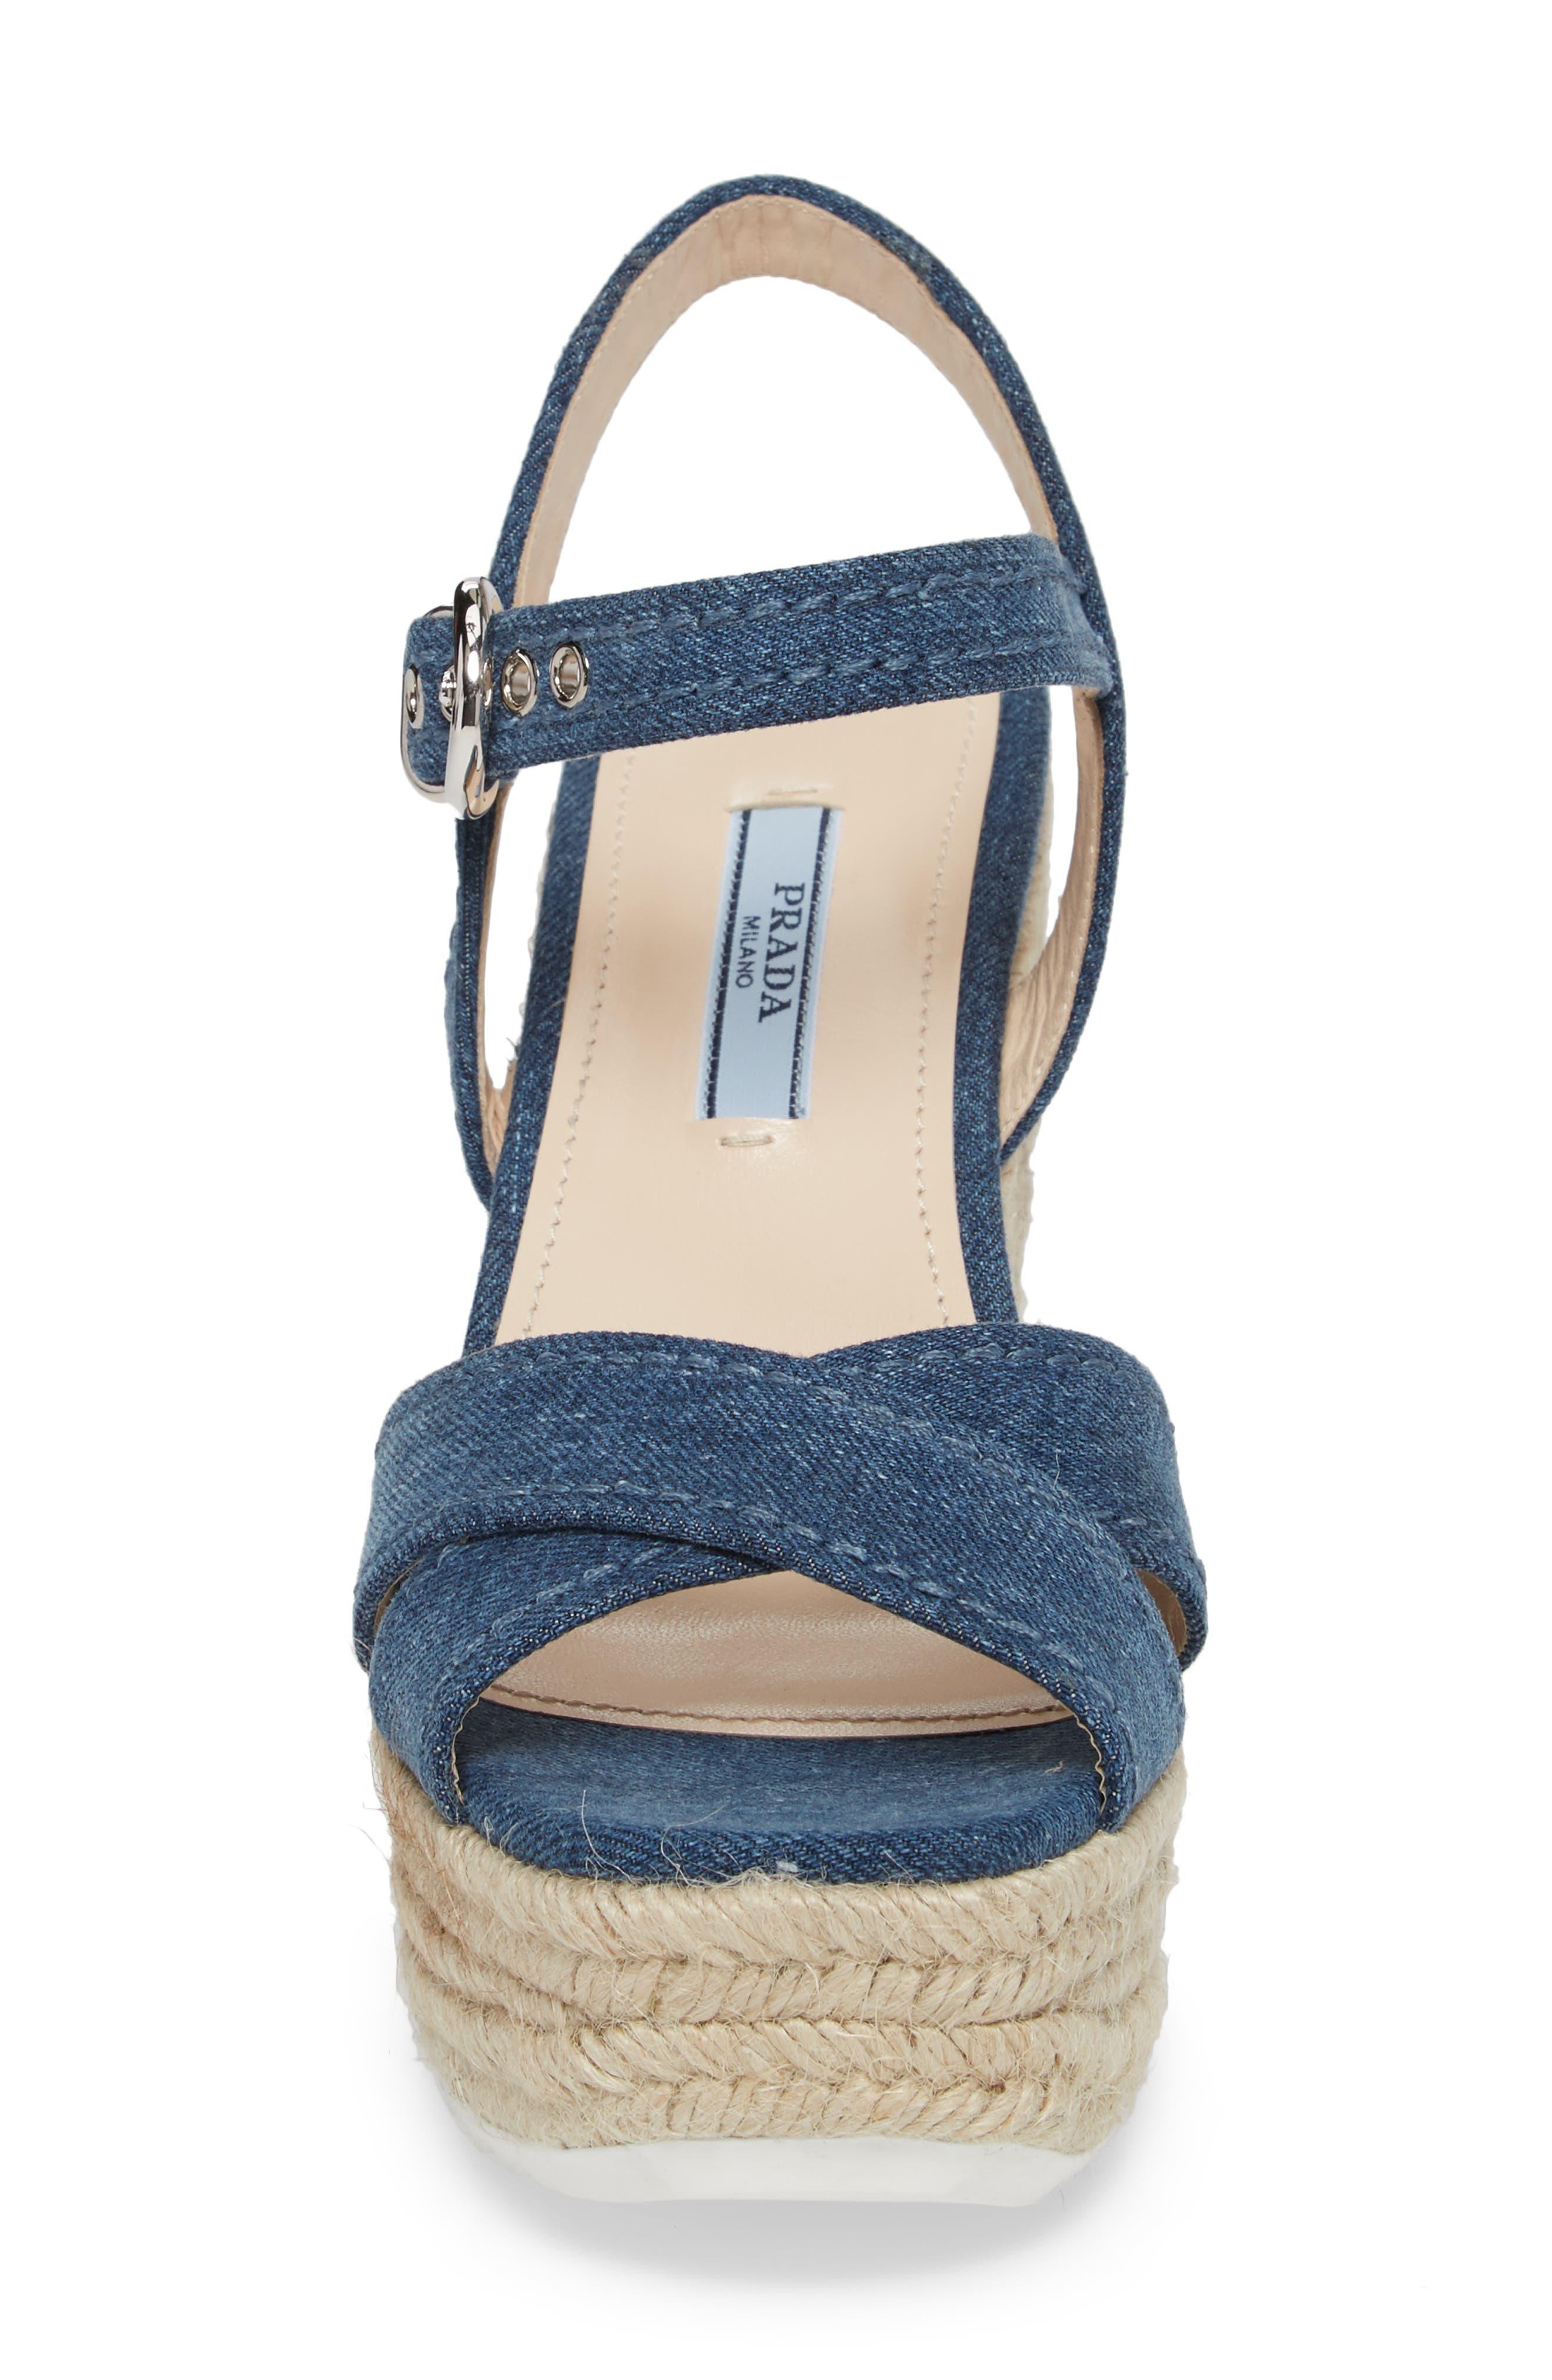 Espadrille Wedge Sandal,                             Alternate thumbnail 4, color,                             Blue